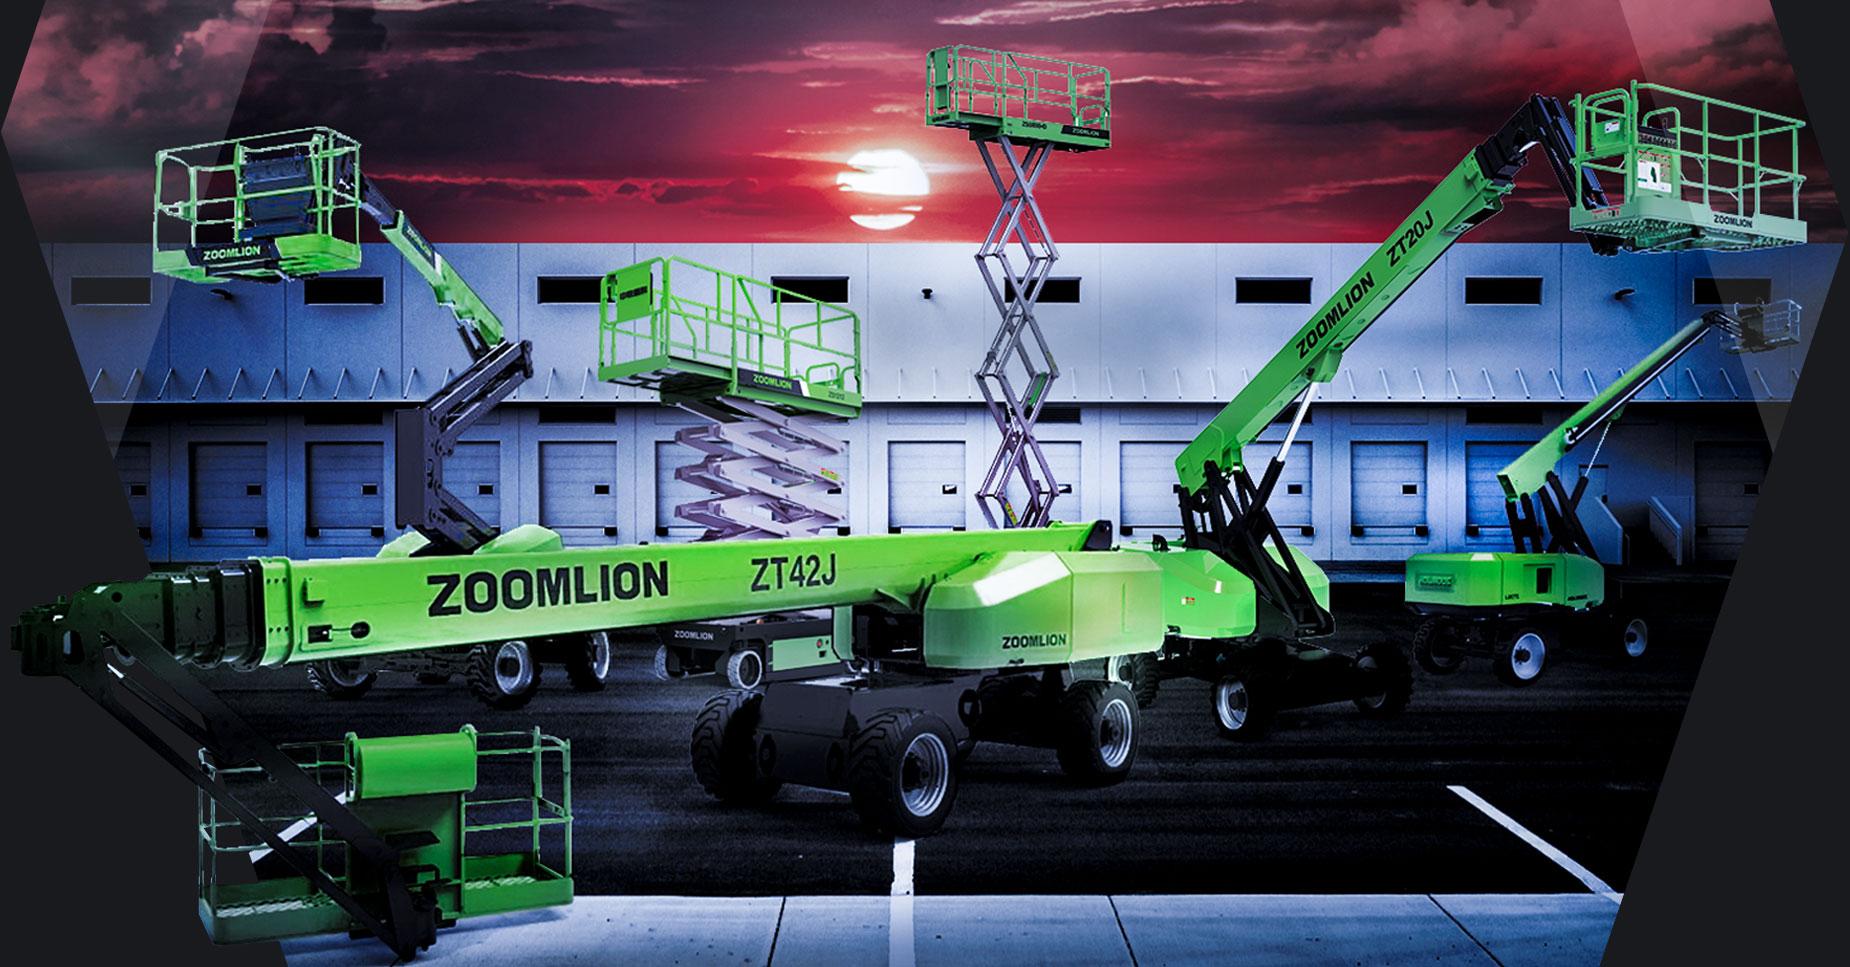 zoomlion sweden sverige lyftar från wts machinery